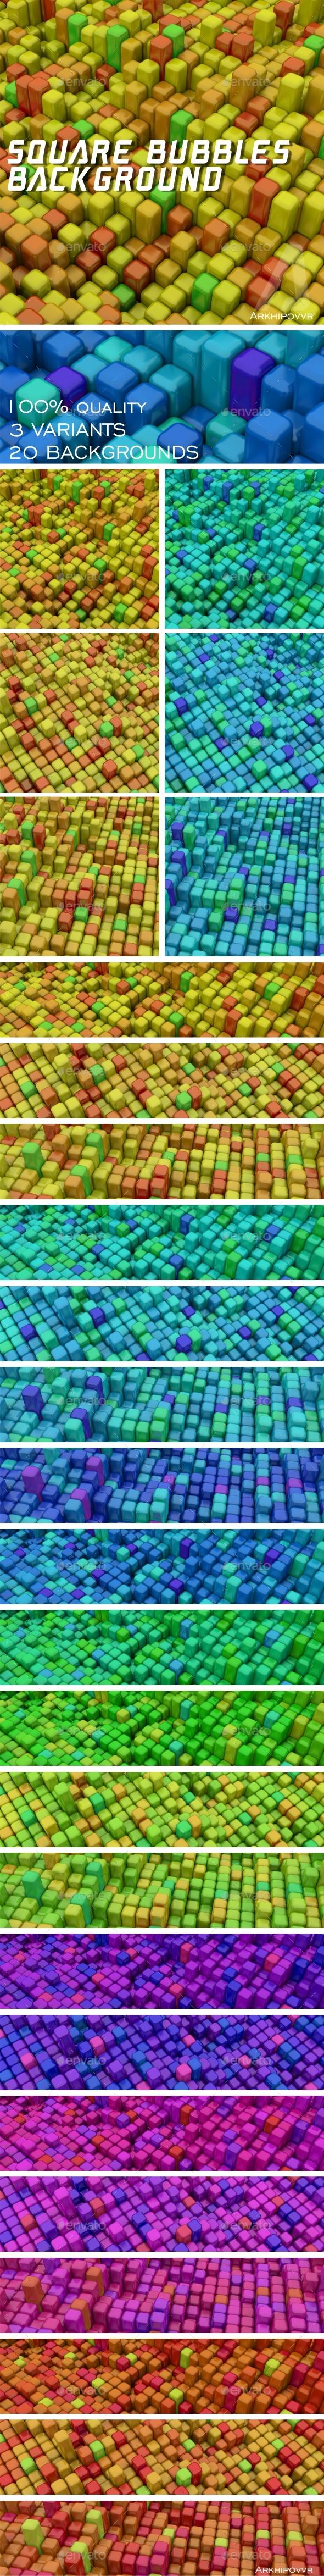 GraphicRiver Square Bubbles Backgrounds 20952928